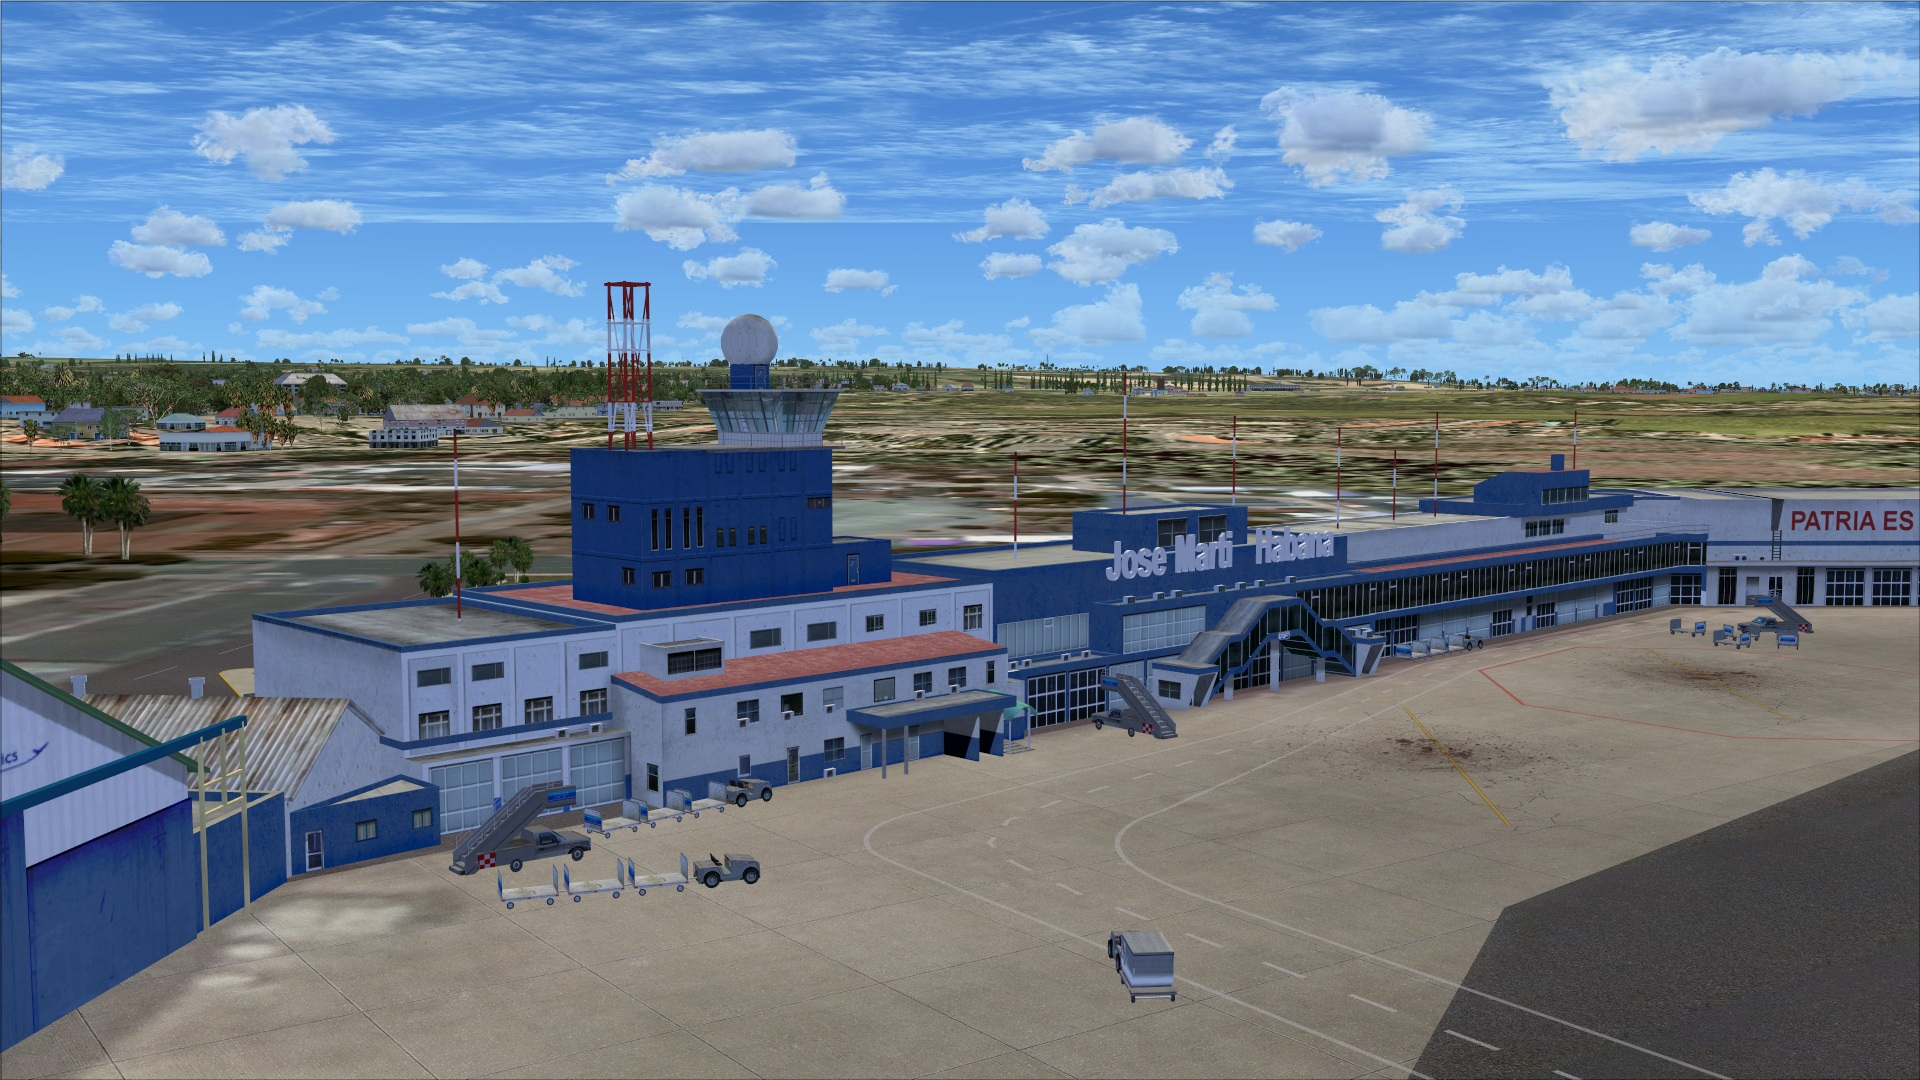 Aeroporto Jose Marti : Review of taxi gate la habana cuba muha fsx josé